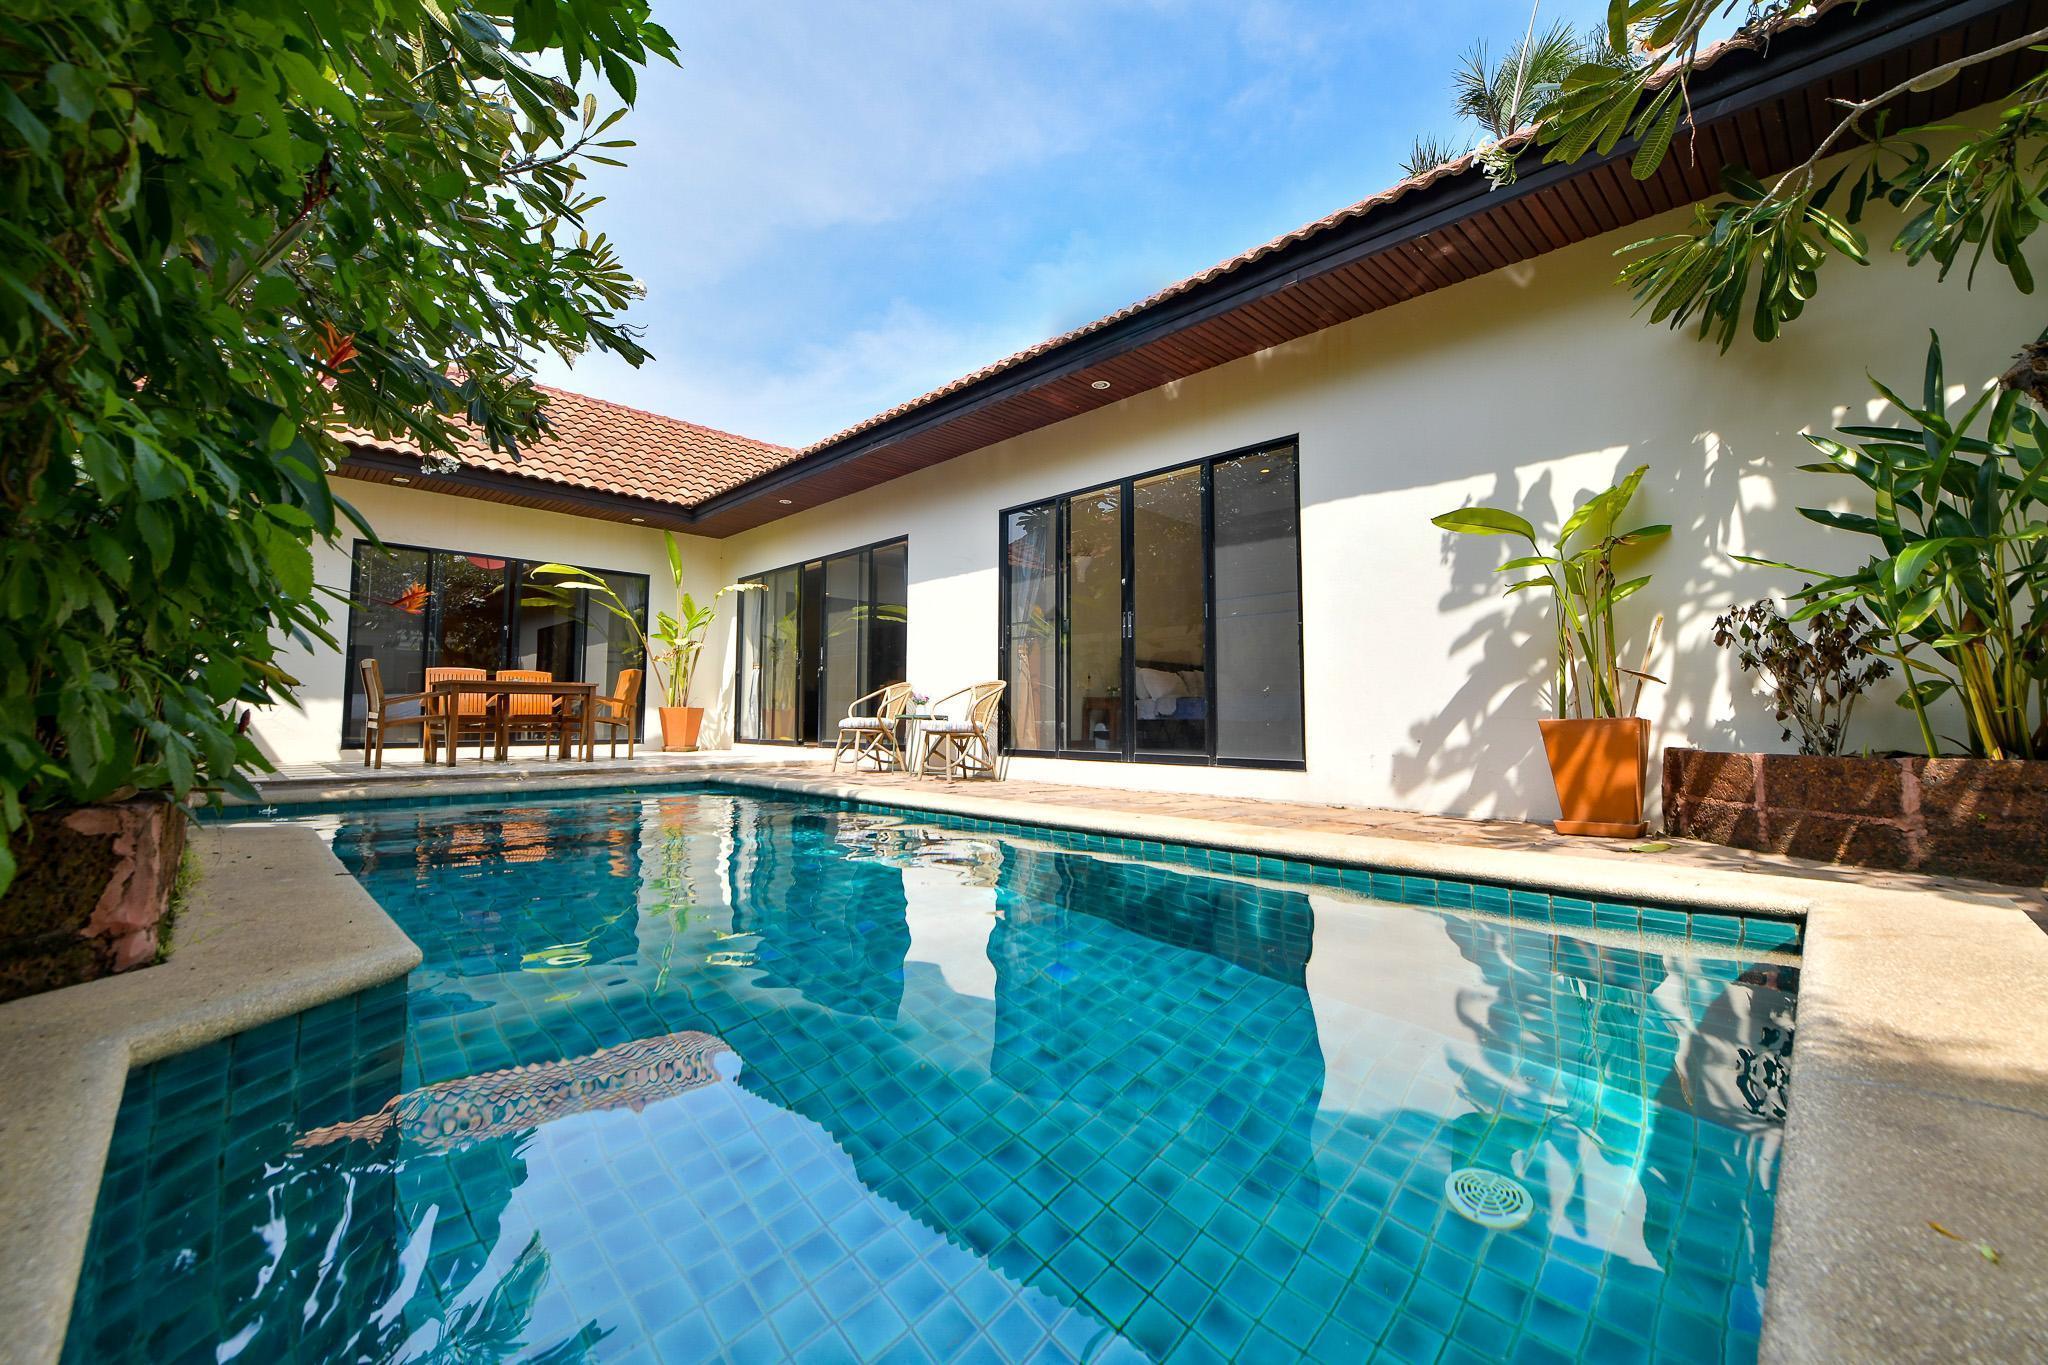 2 BR Pool Villa 800 m beach 3 km walkingstreet วิลลา 2 ห้องนอน 2 ห้องน้ำส่วนตัว ขนาด 240 ตร.ม. – หาดจอมเทียน